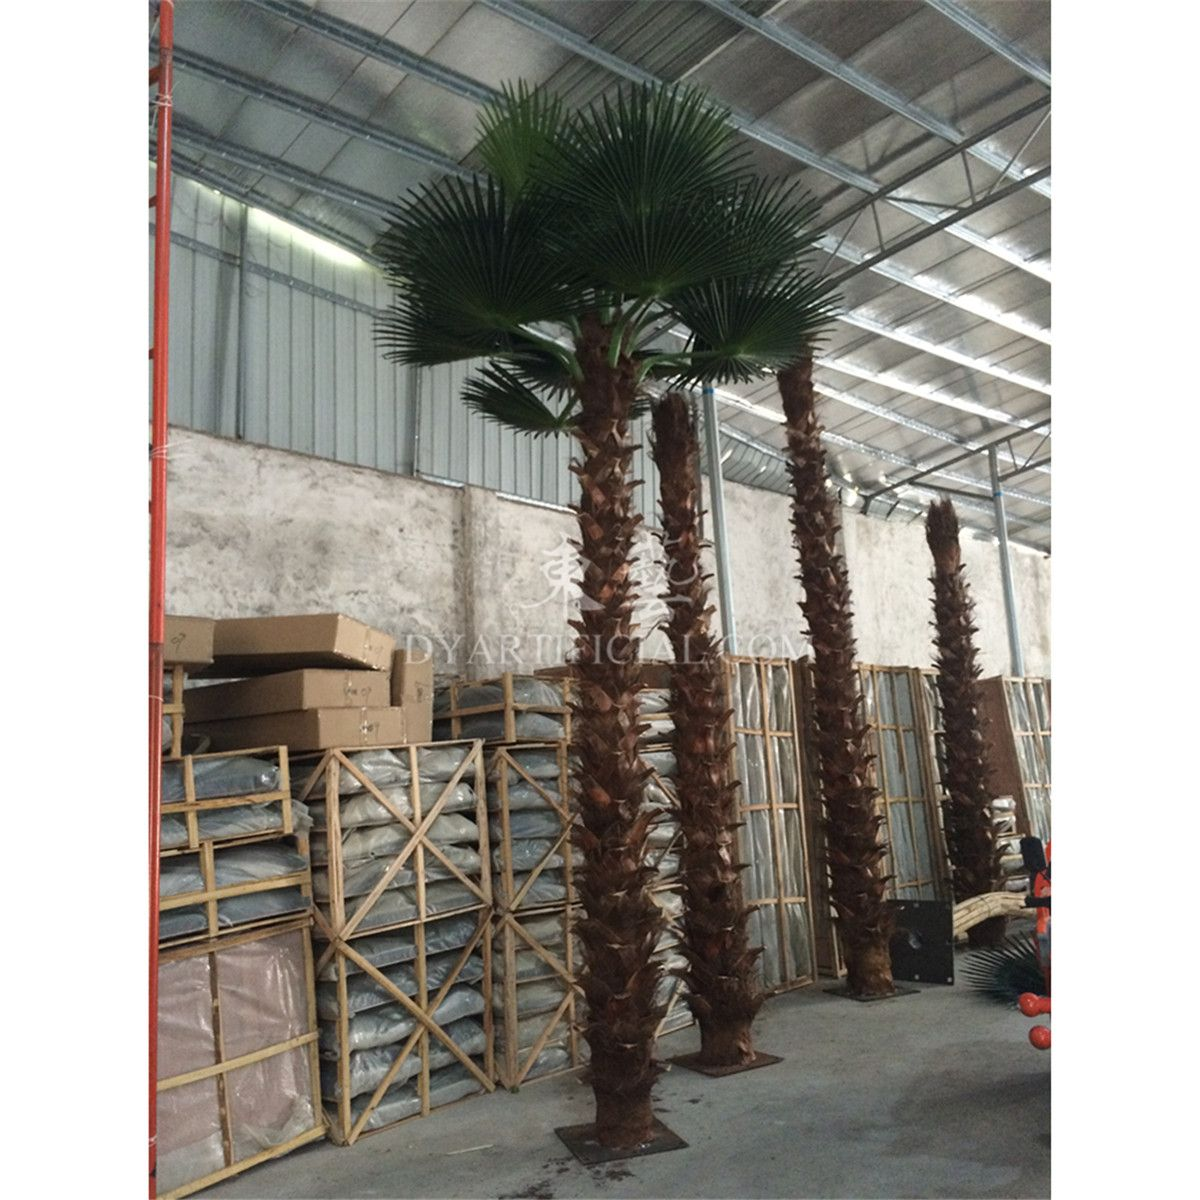 Tazls 20 Artificial Palm Tree